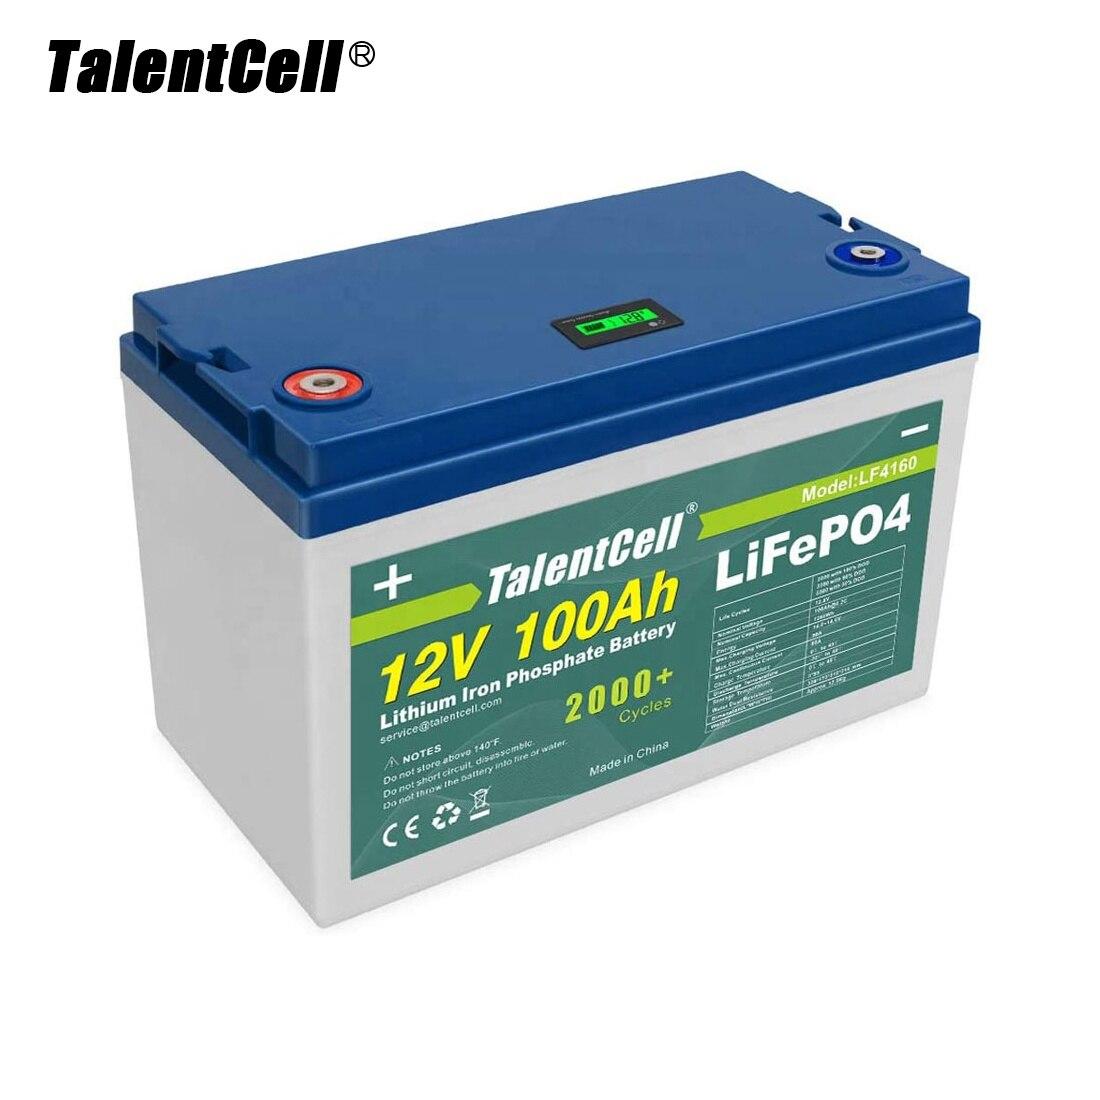 TalentCell شحن مجاني بطارية شمسية دائرة عميقة 32700 خلية 12.8 فولت 100/200/200/300 أمبير بطاريات ليثيوم الحديد الفوسفات LiFePO4